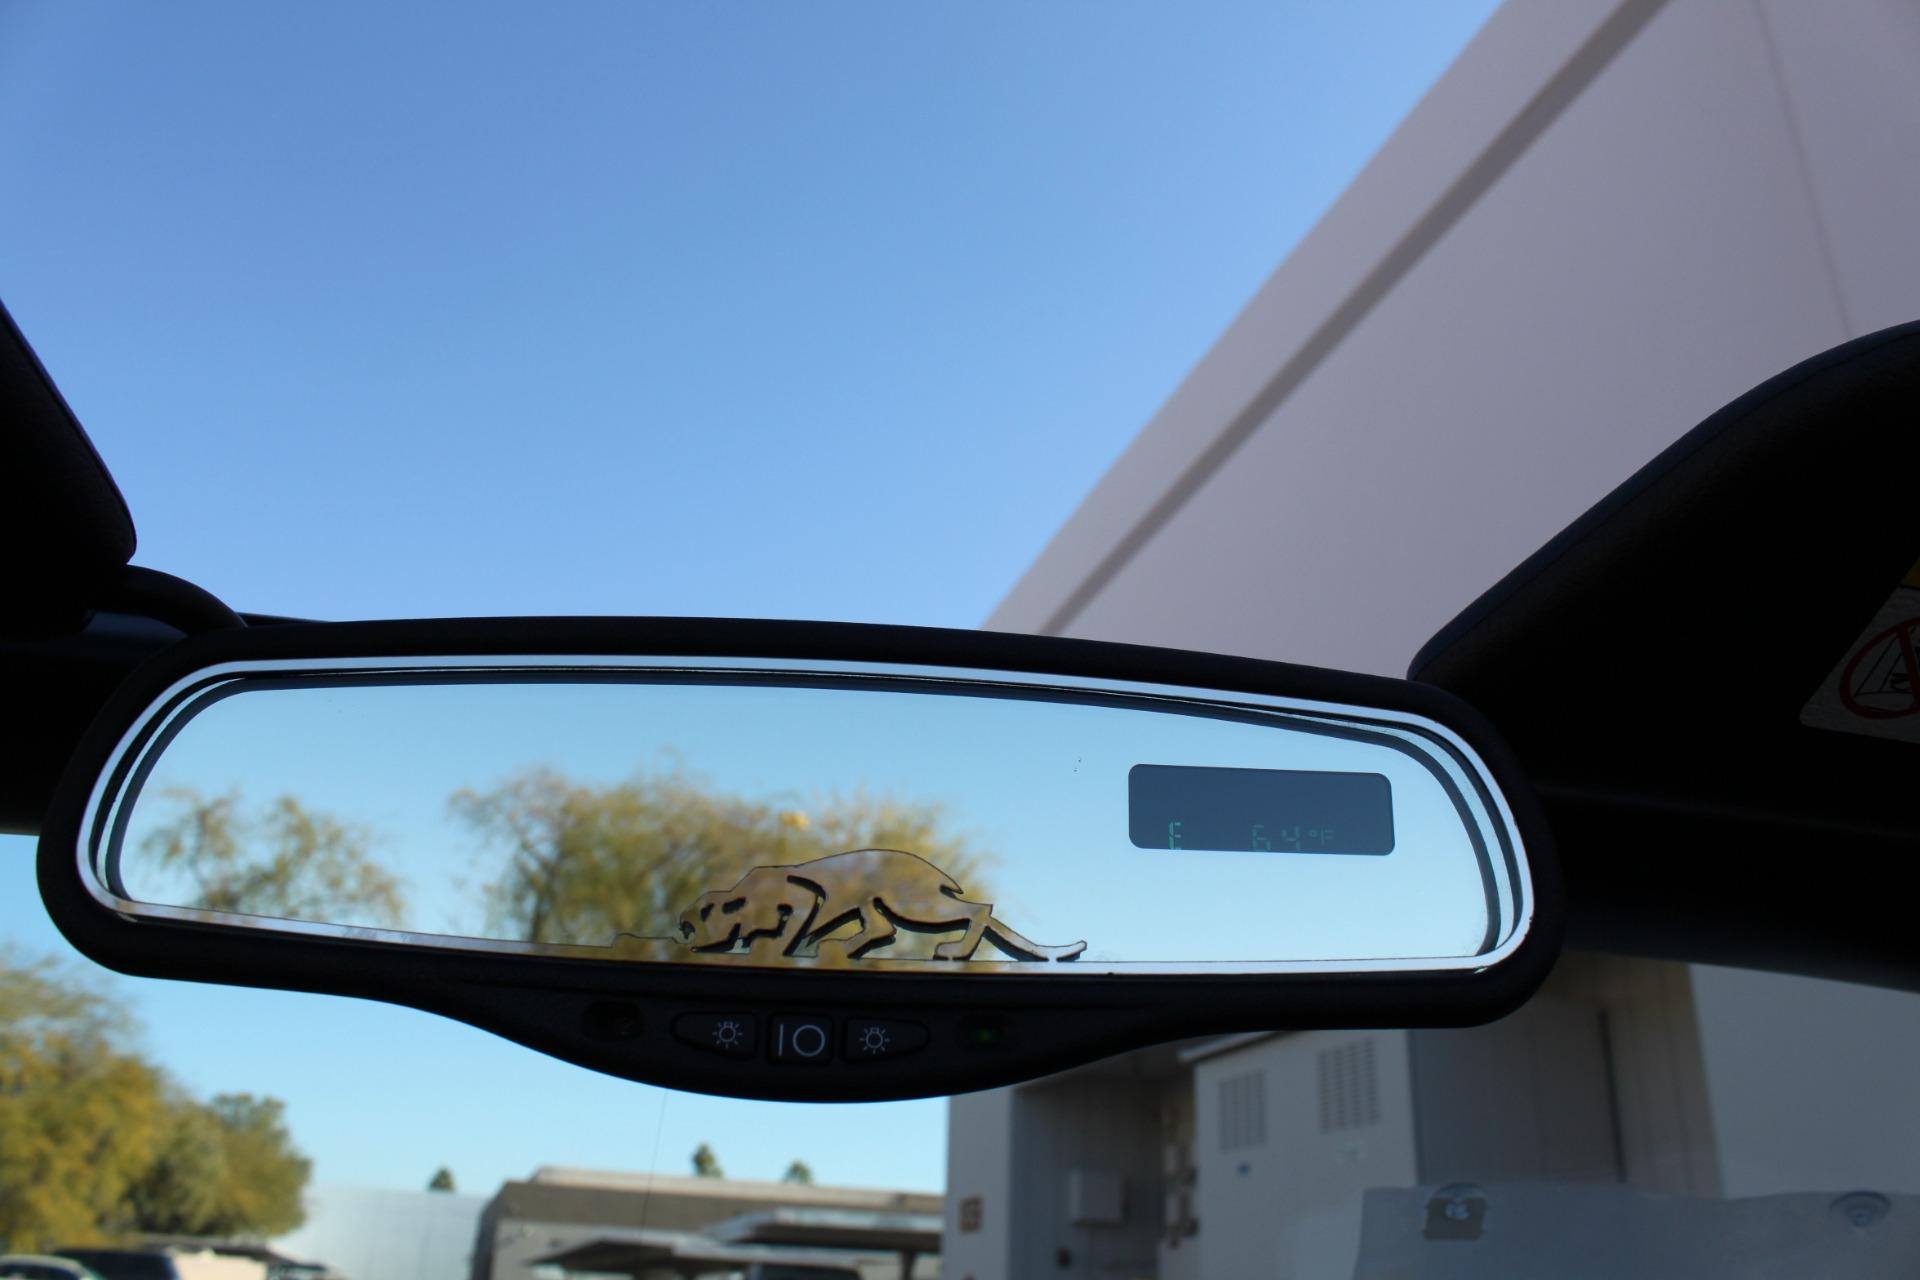 Used-2002-Chrysler-Prowler-vintage